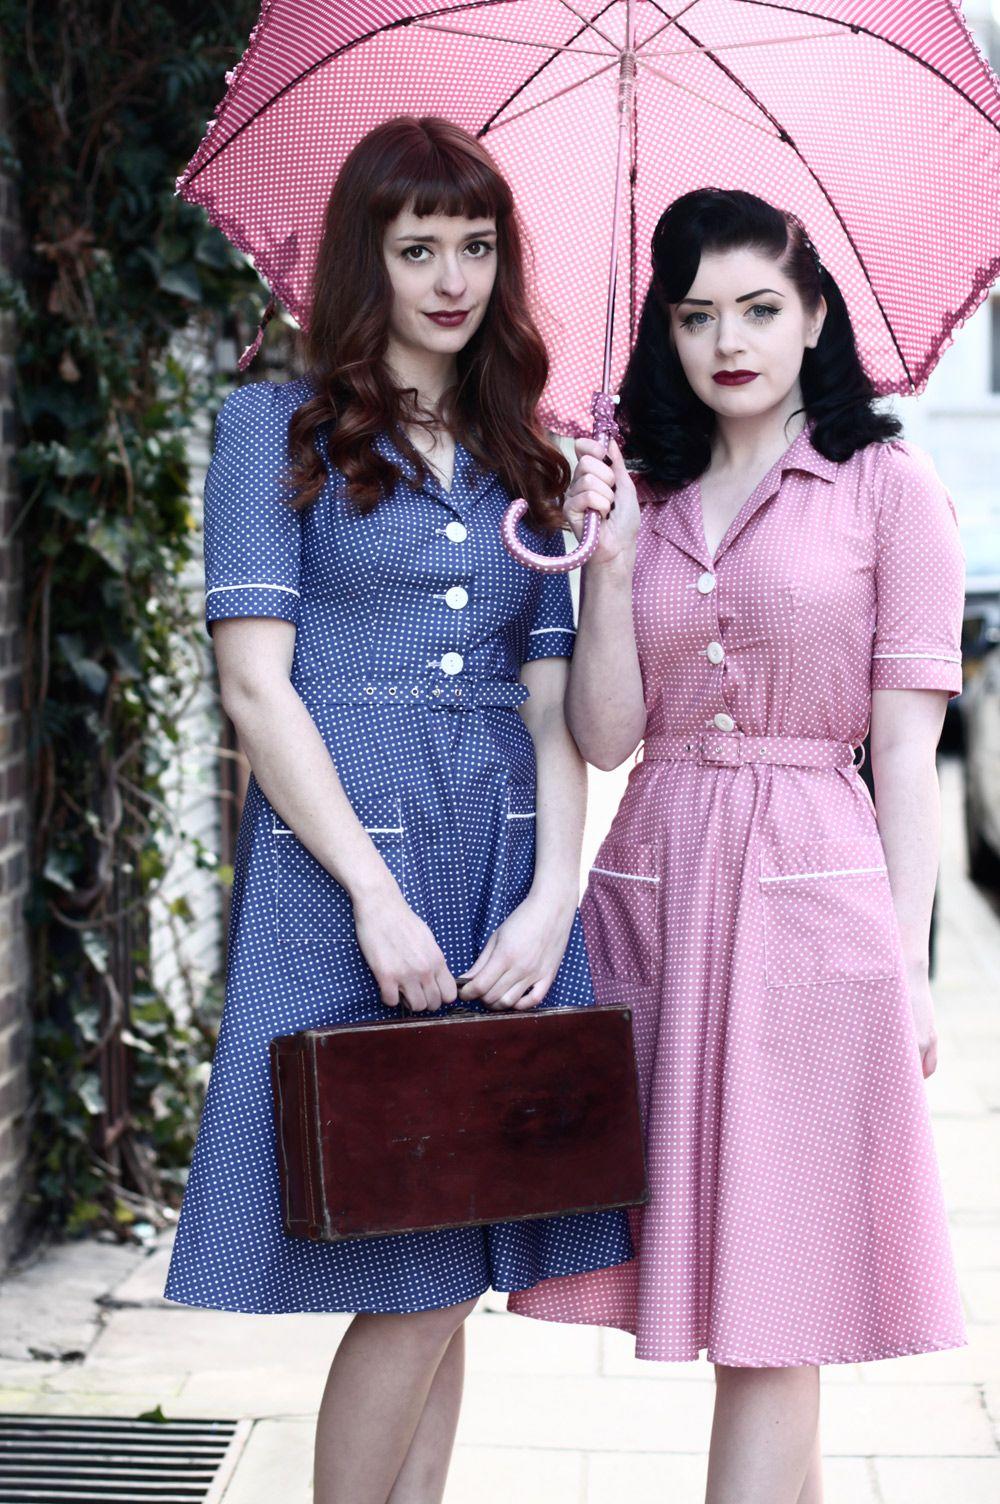 Tara Starlet 1940s 40s Style: Friday Frock Love: Spring Spots